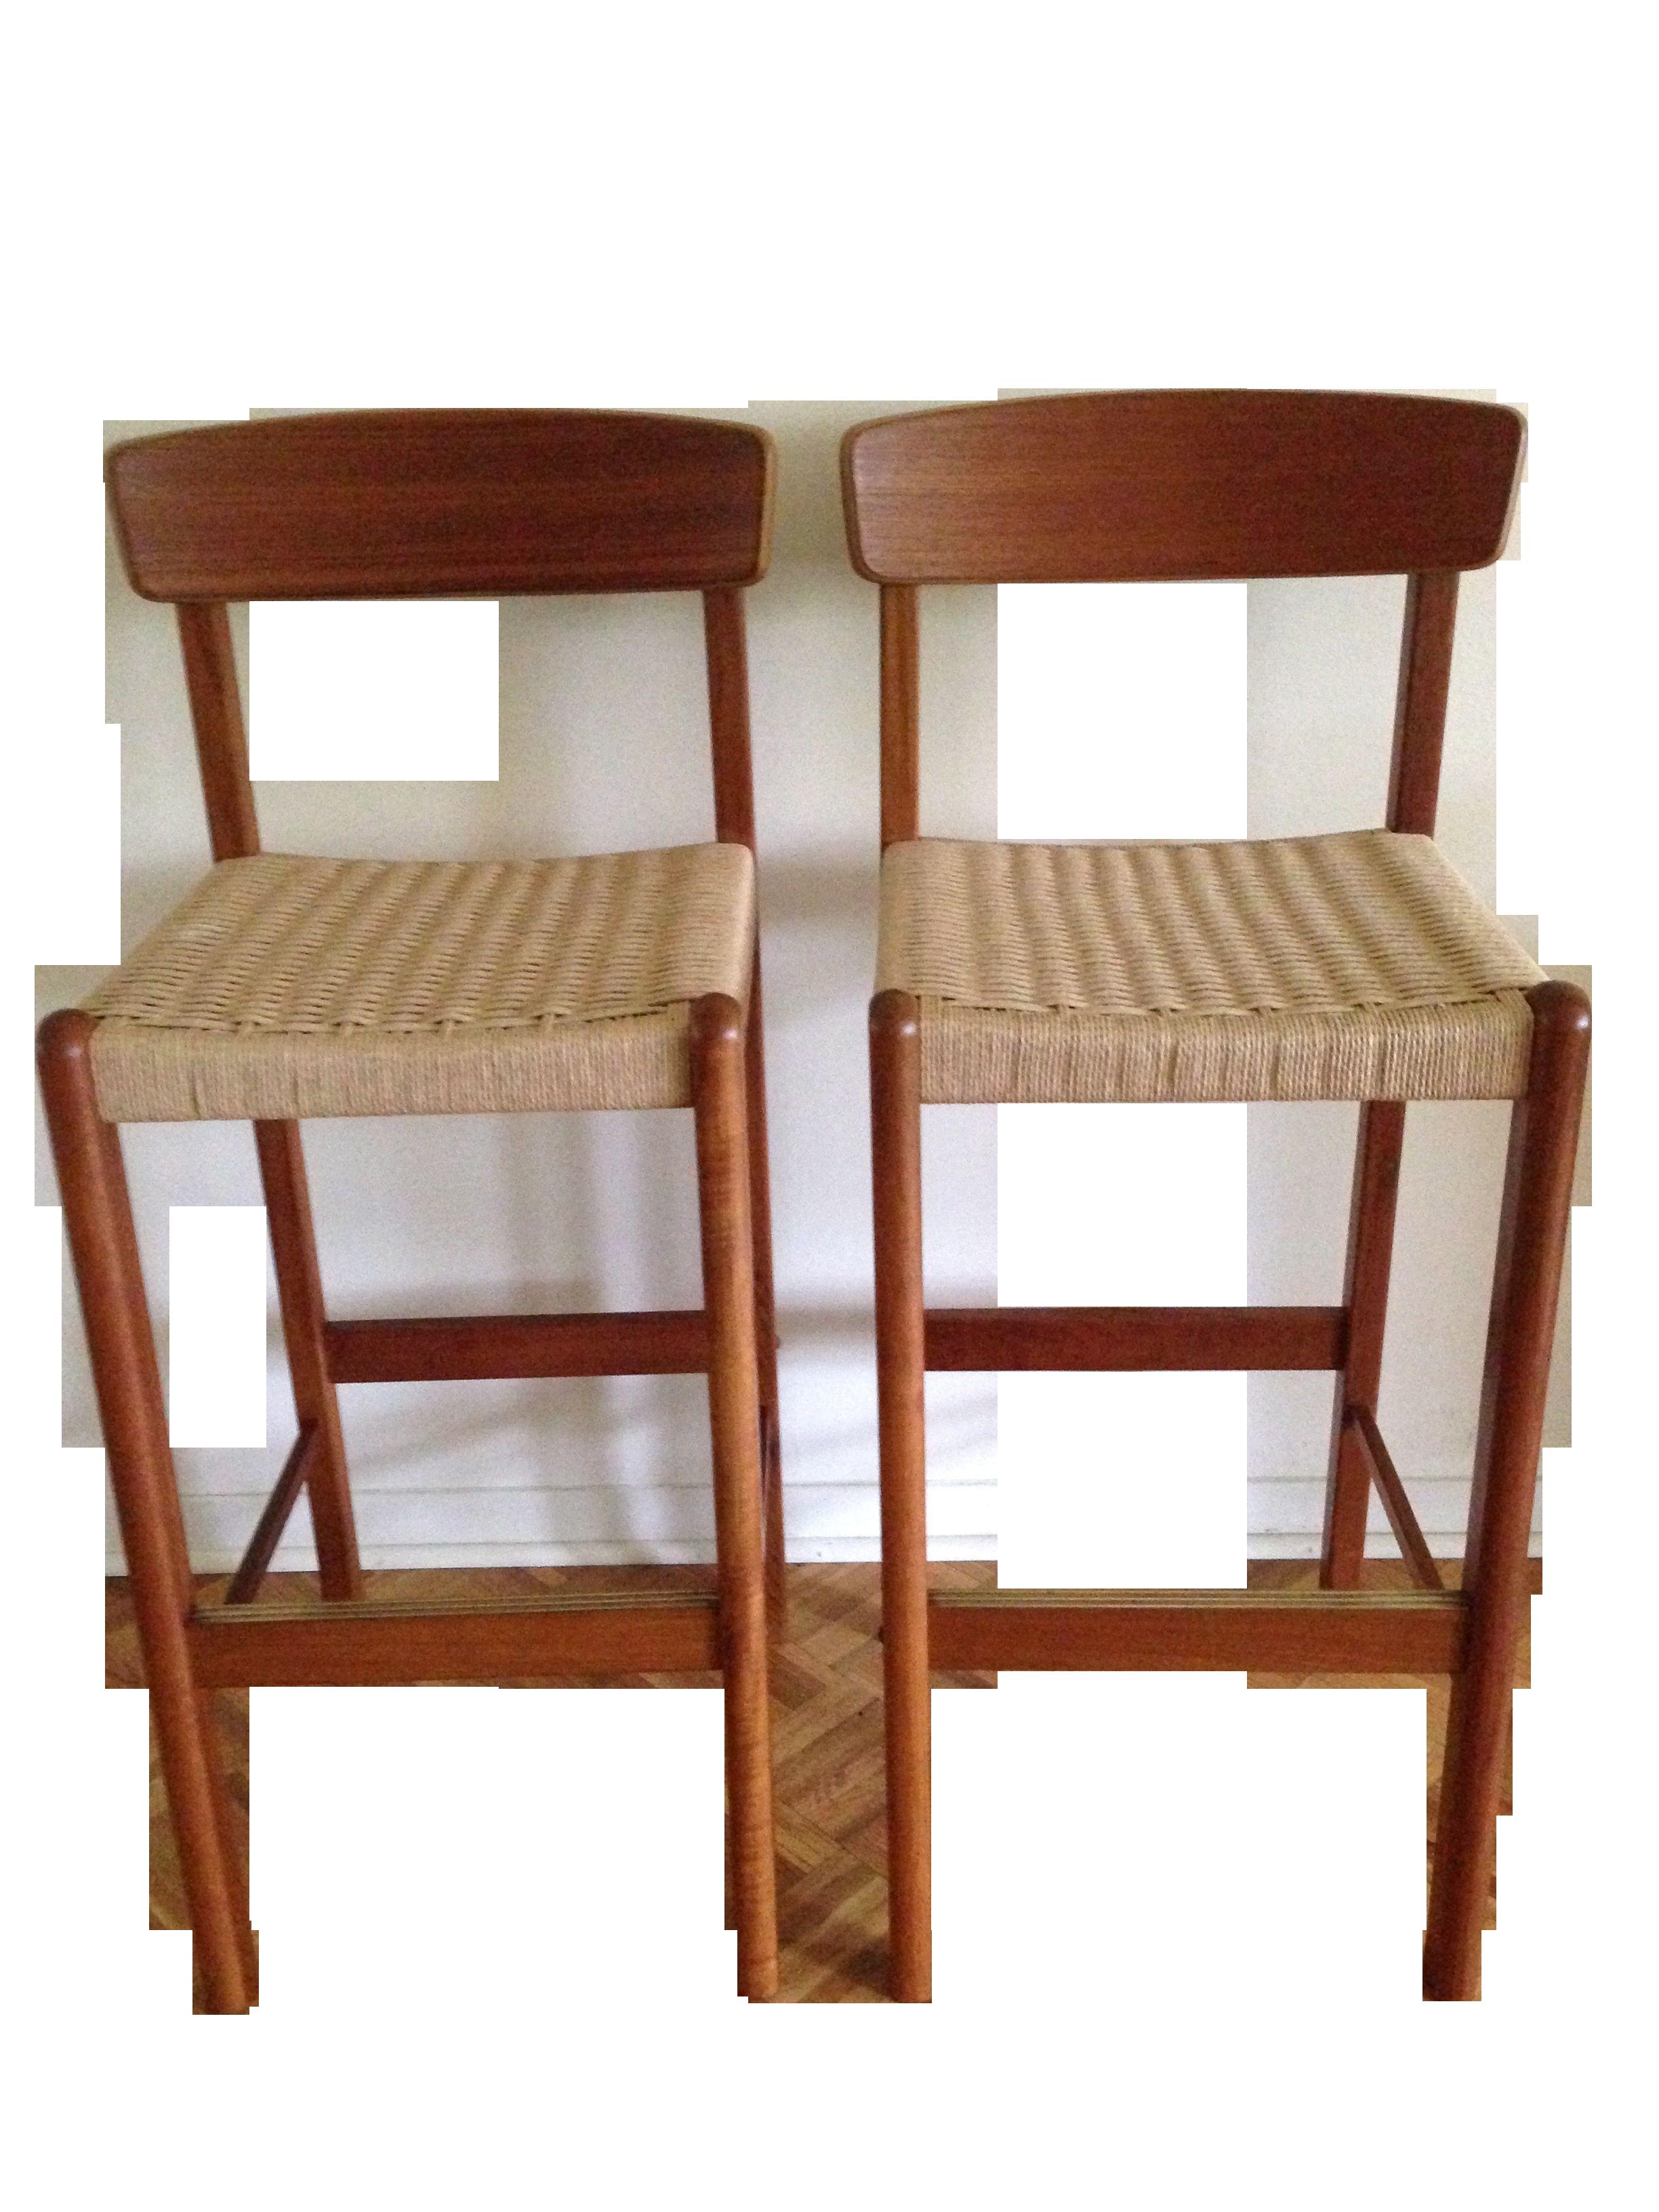 teak bar stools moller style a pair on chairish com stools